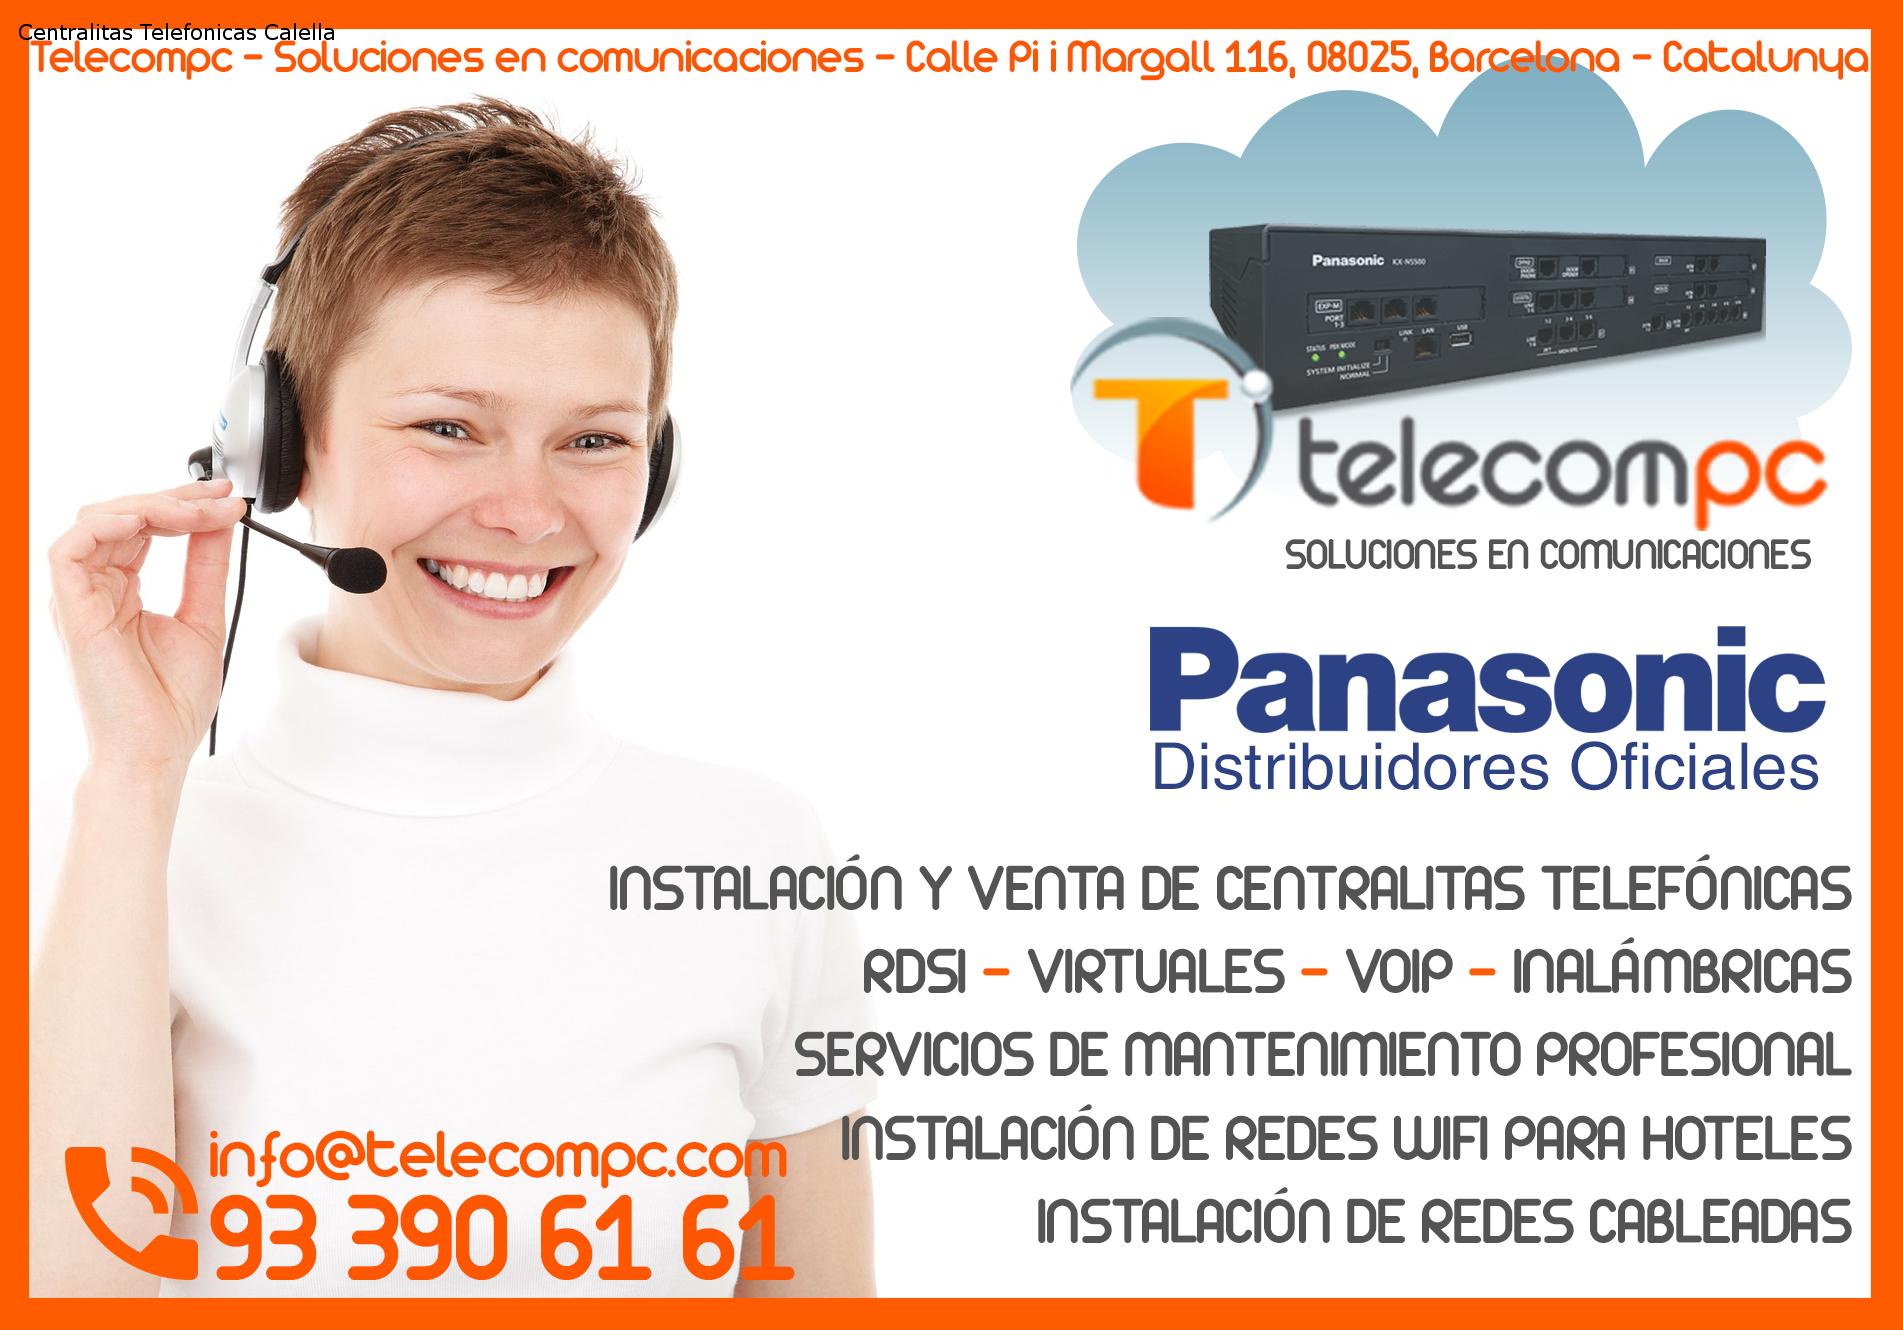 Centralitas Telefonicas Calella